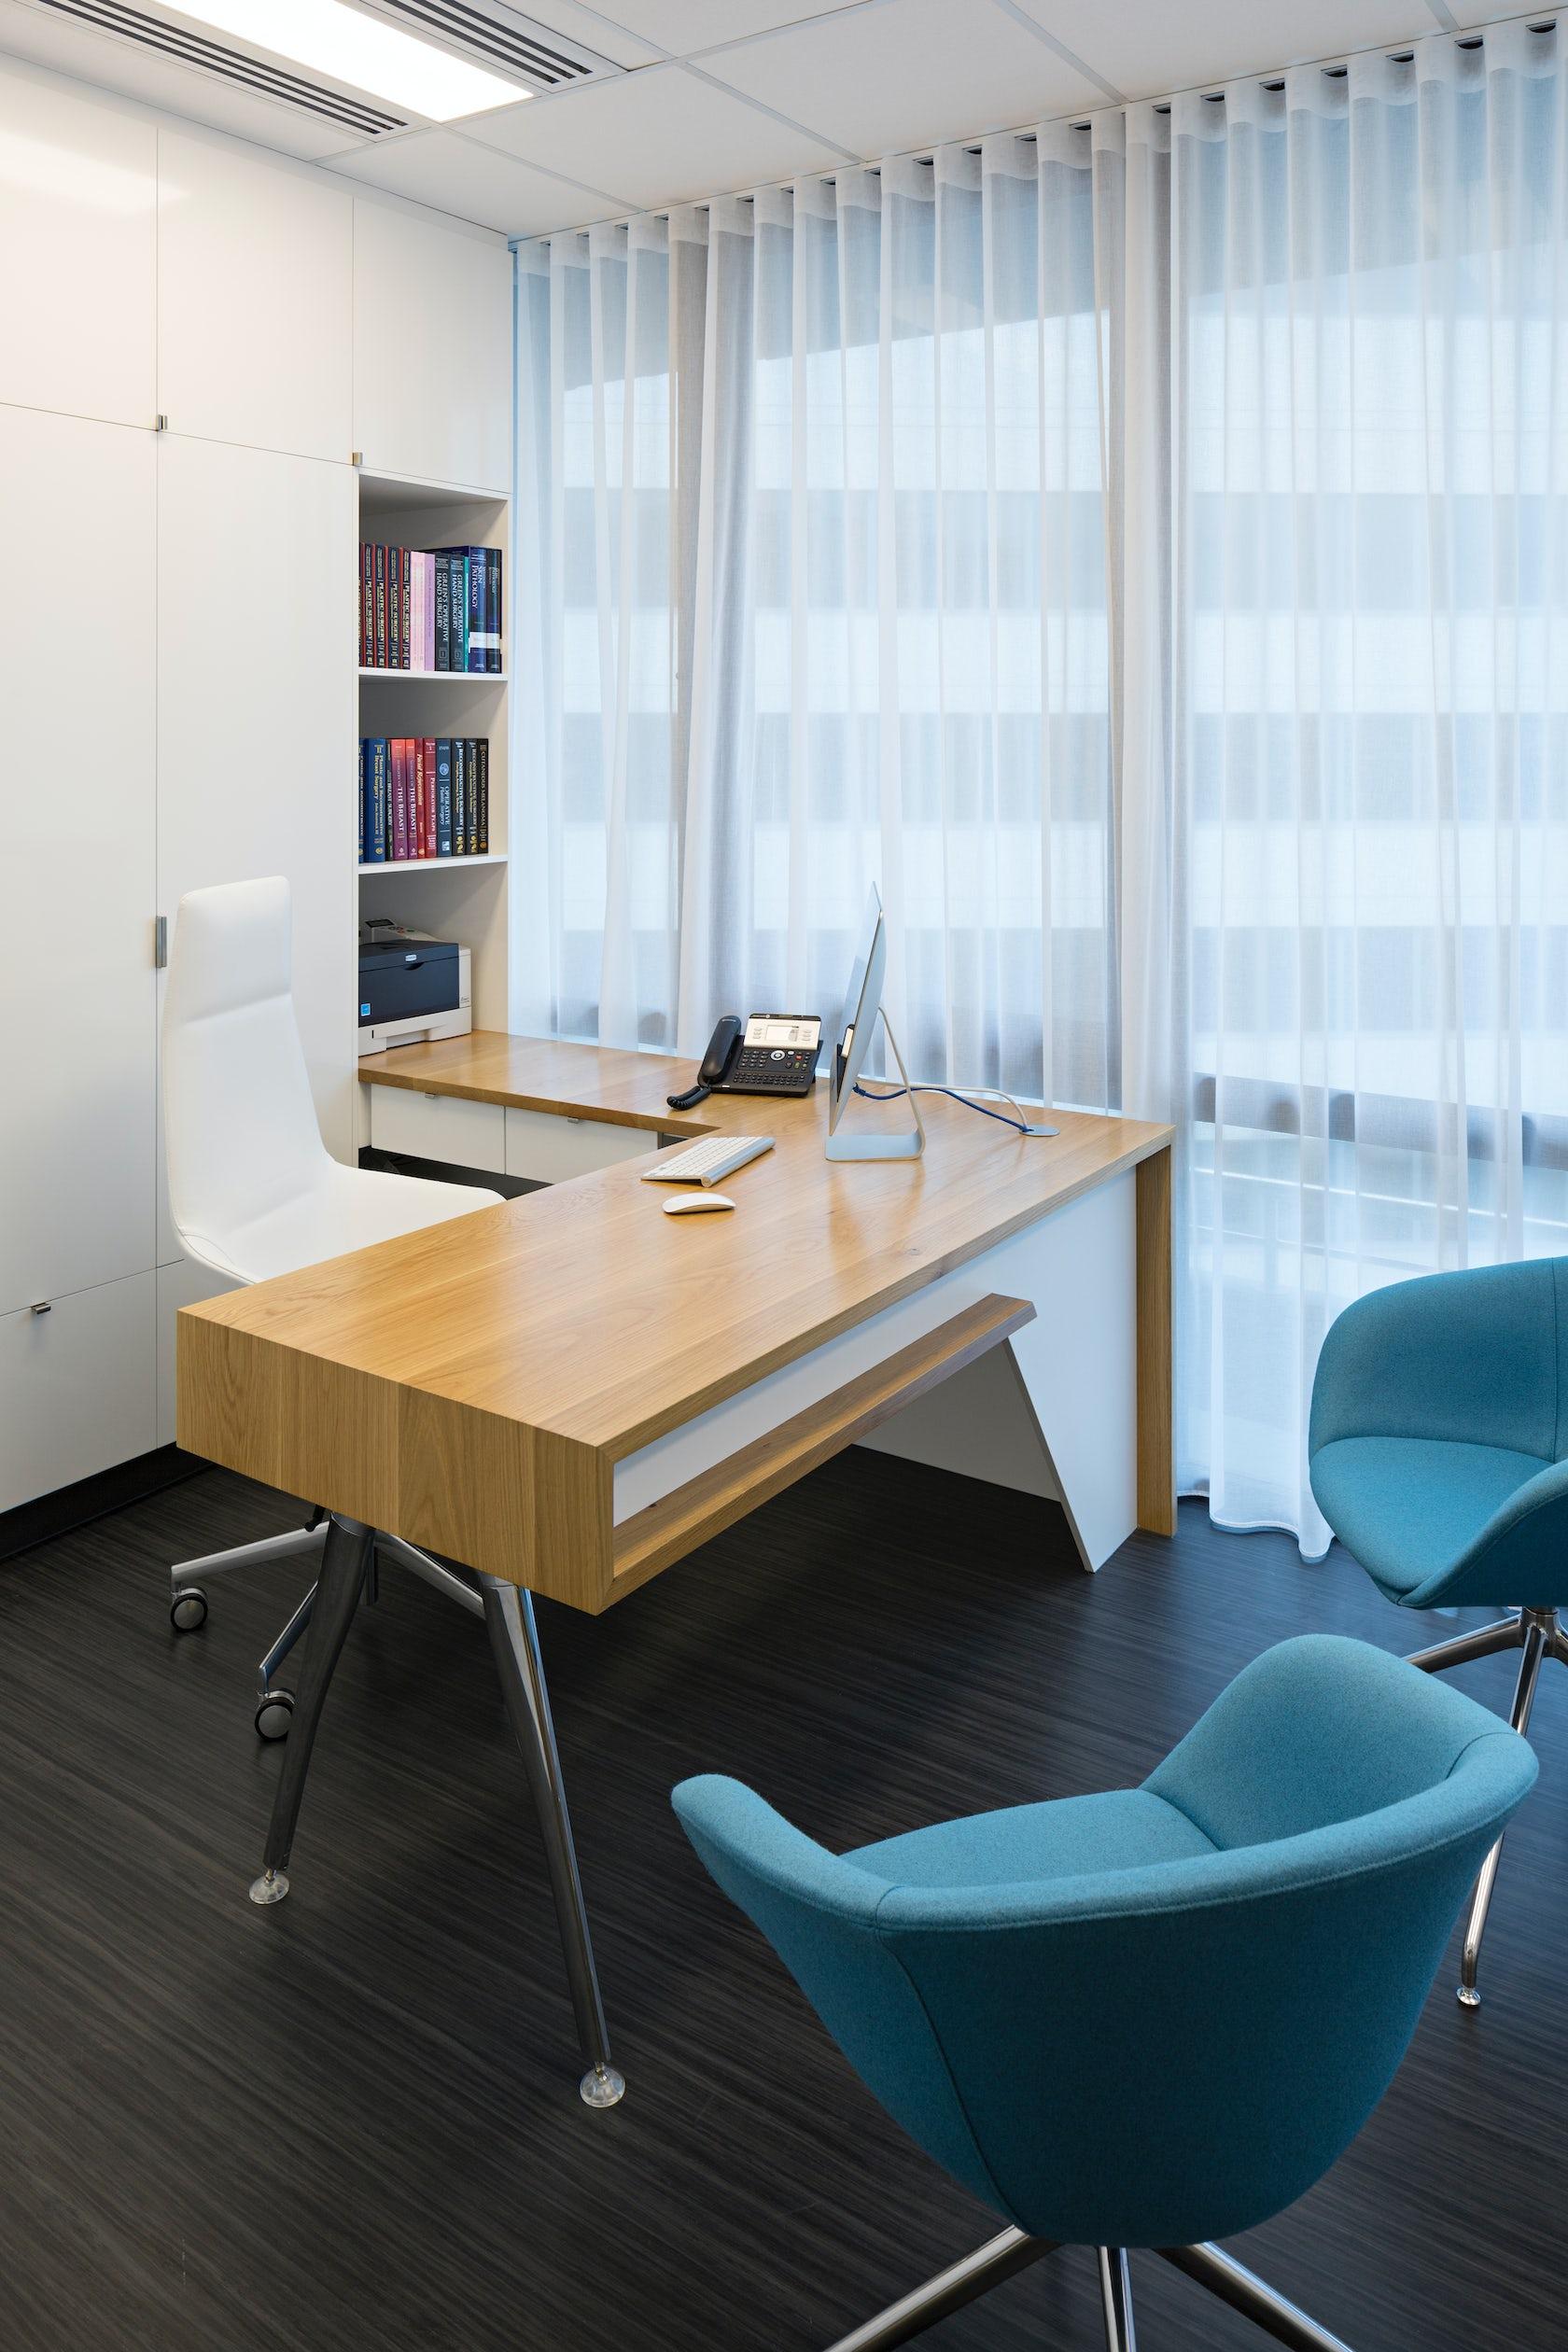 Professional Room Designer: A & R Plastic Surgery